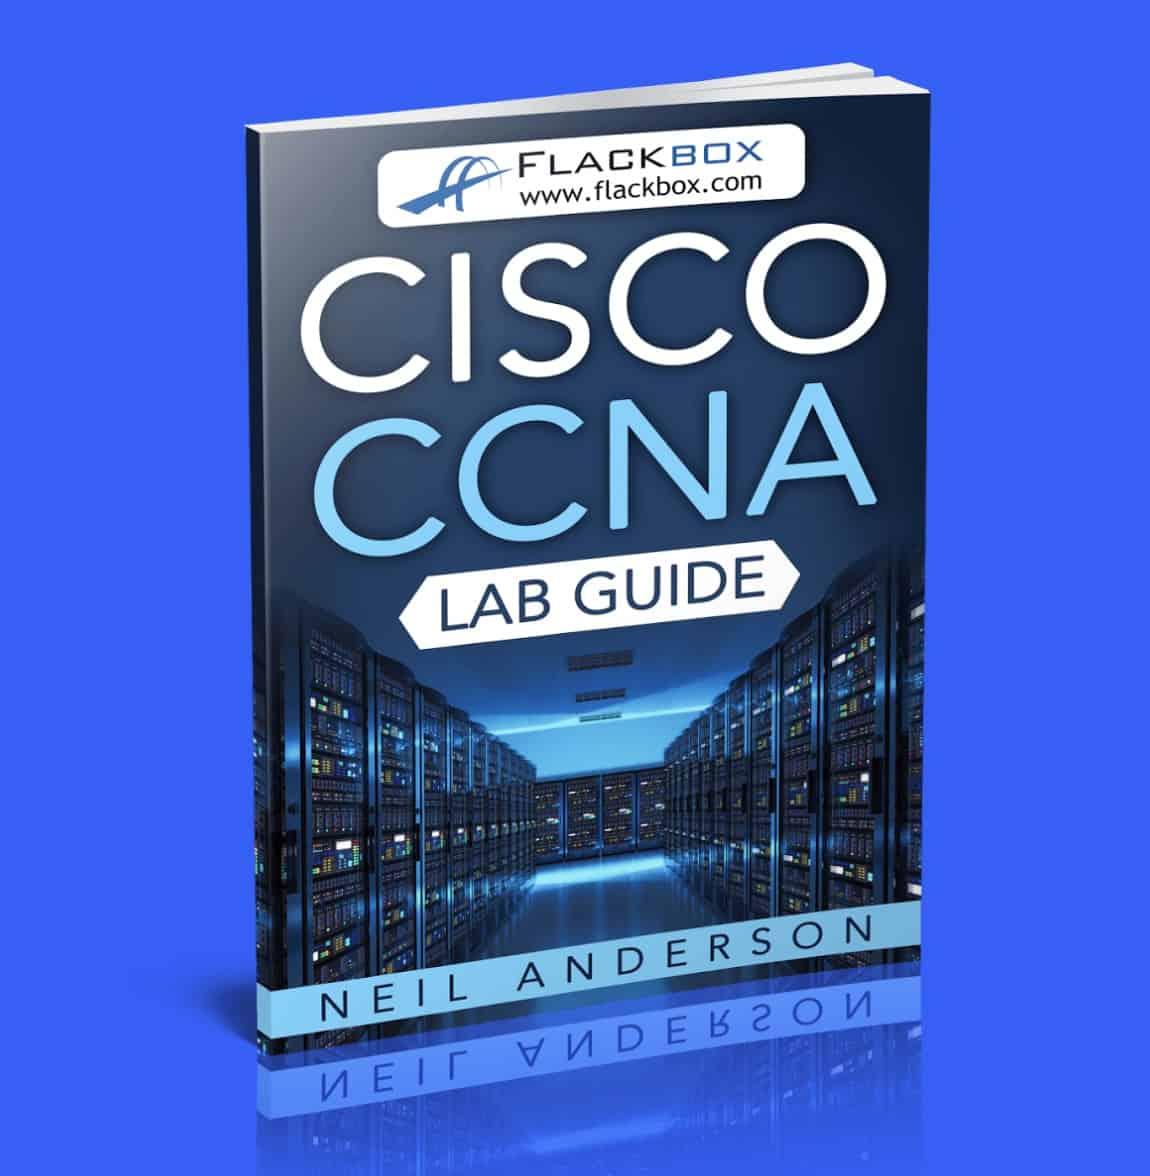 free ccna lab guide flackbox